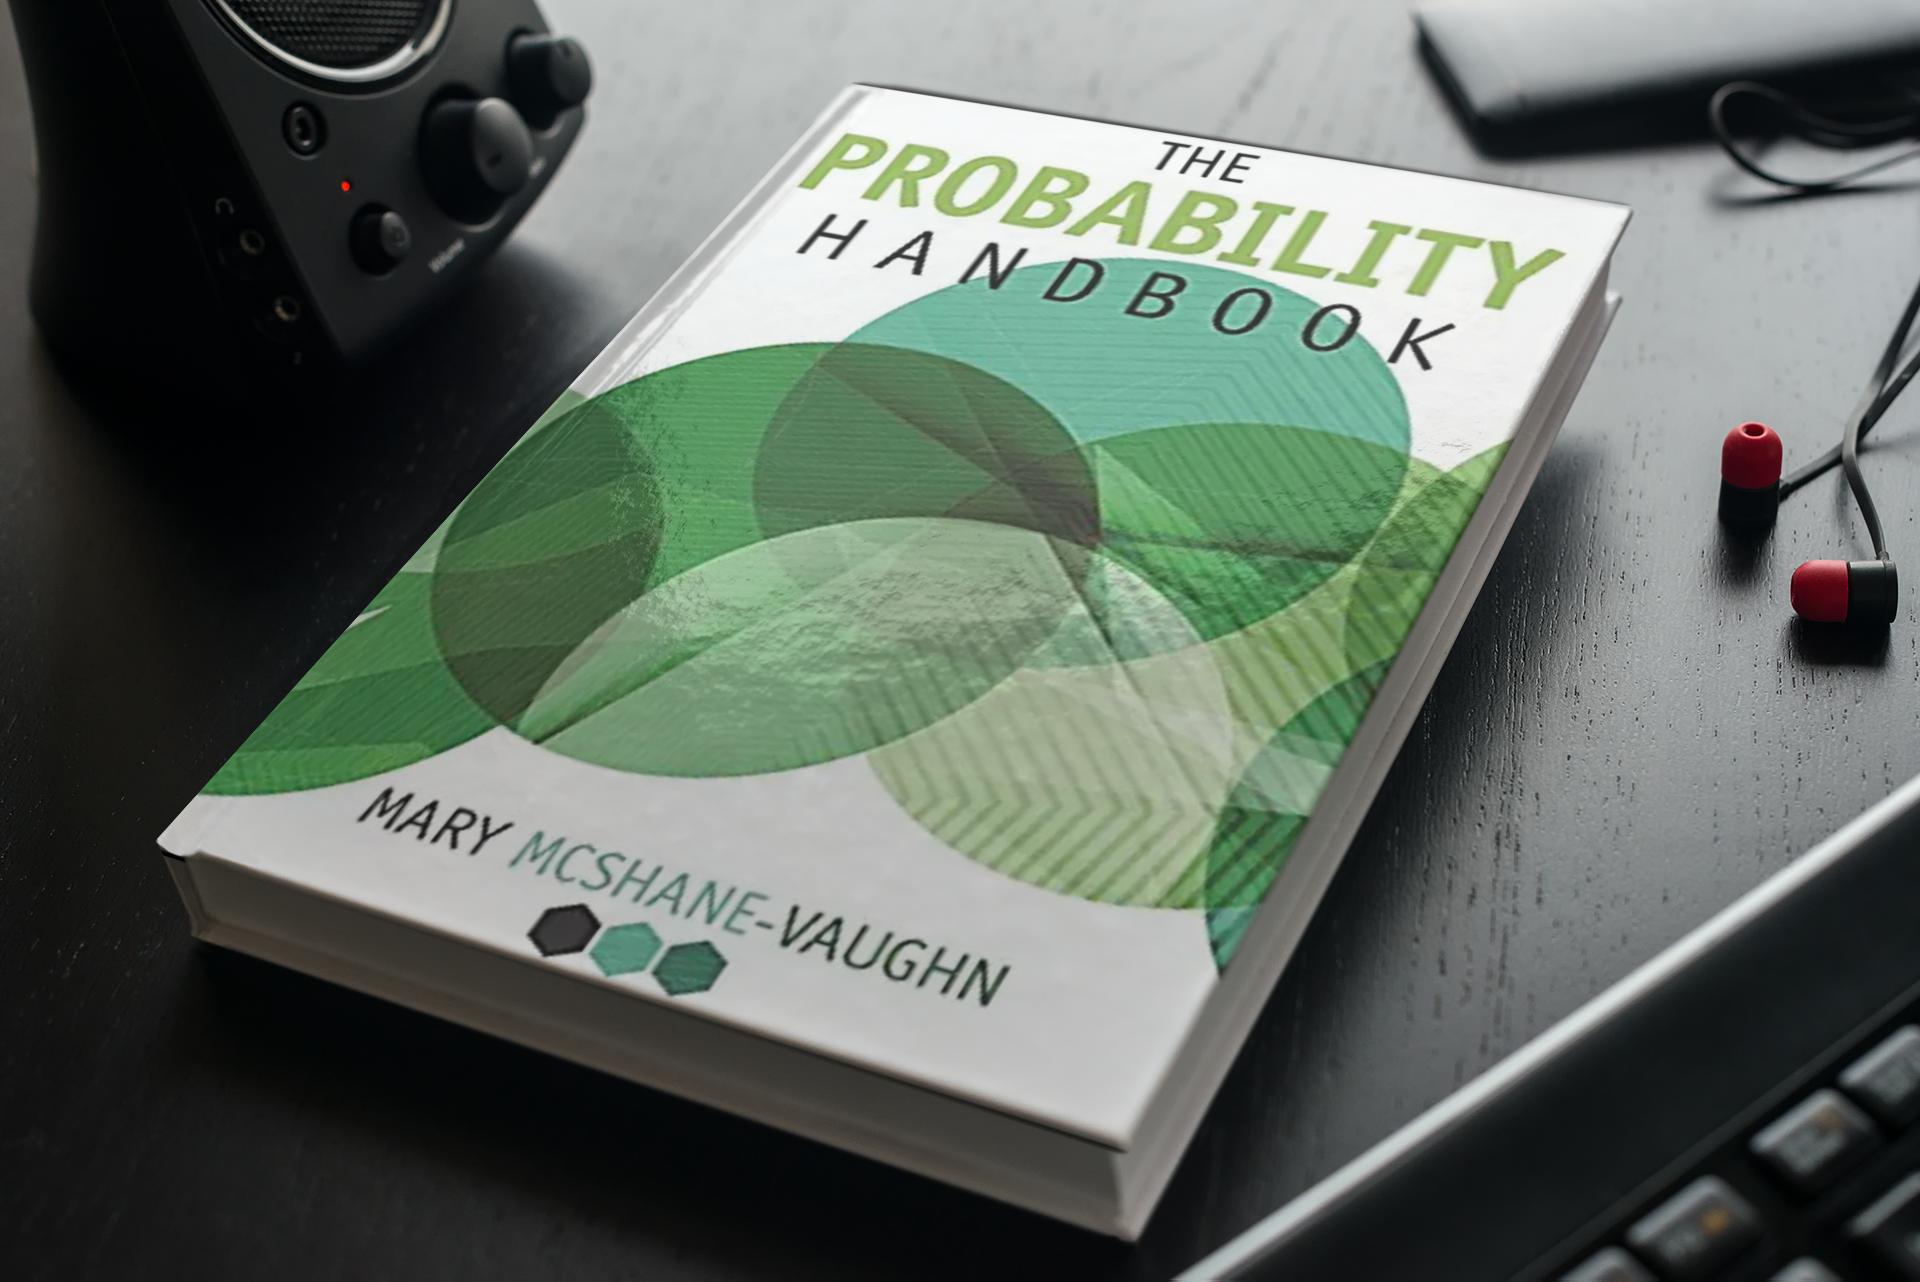 The Probability Handbook textbook